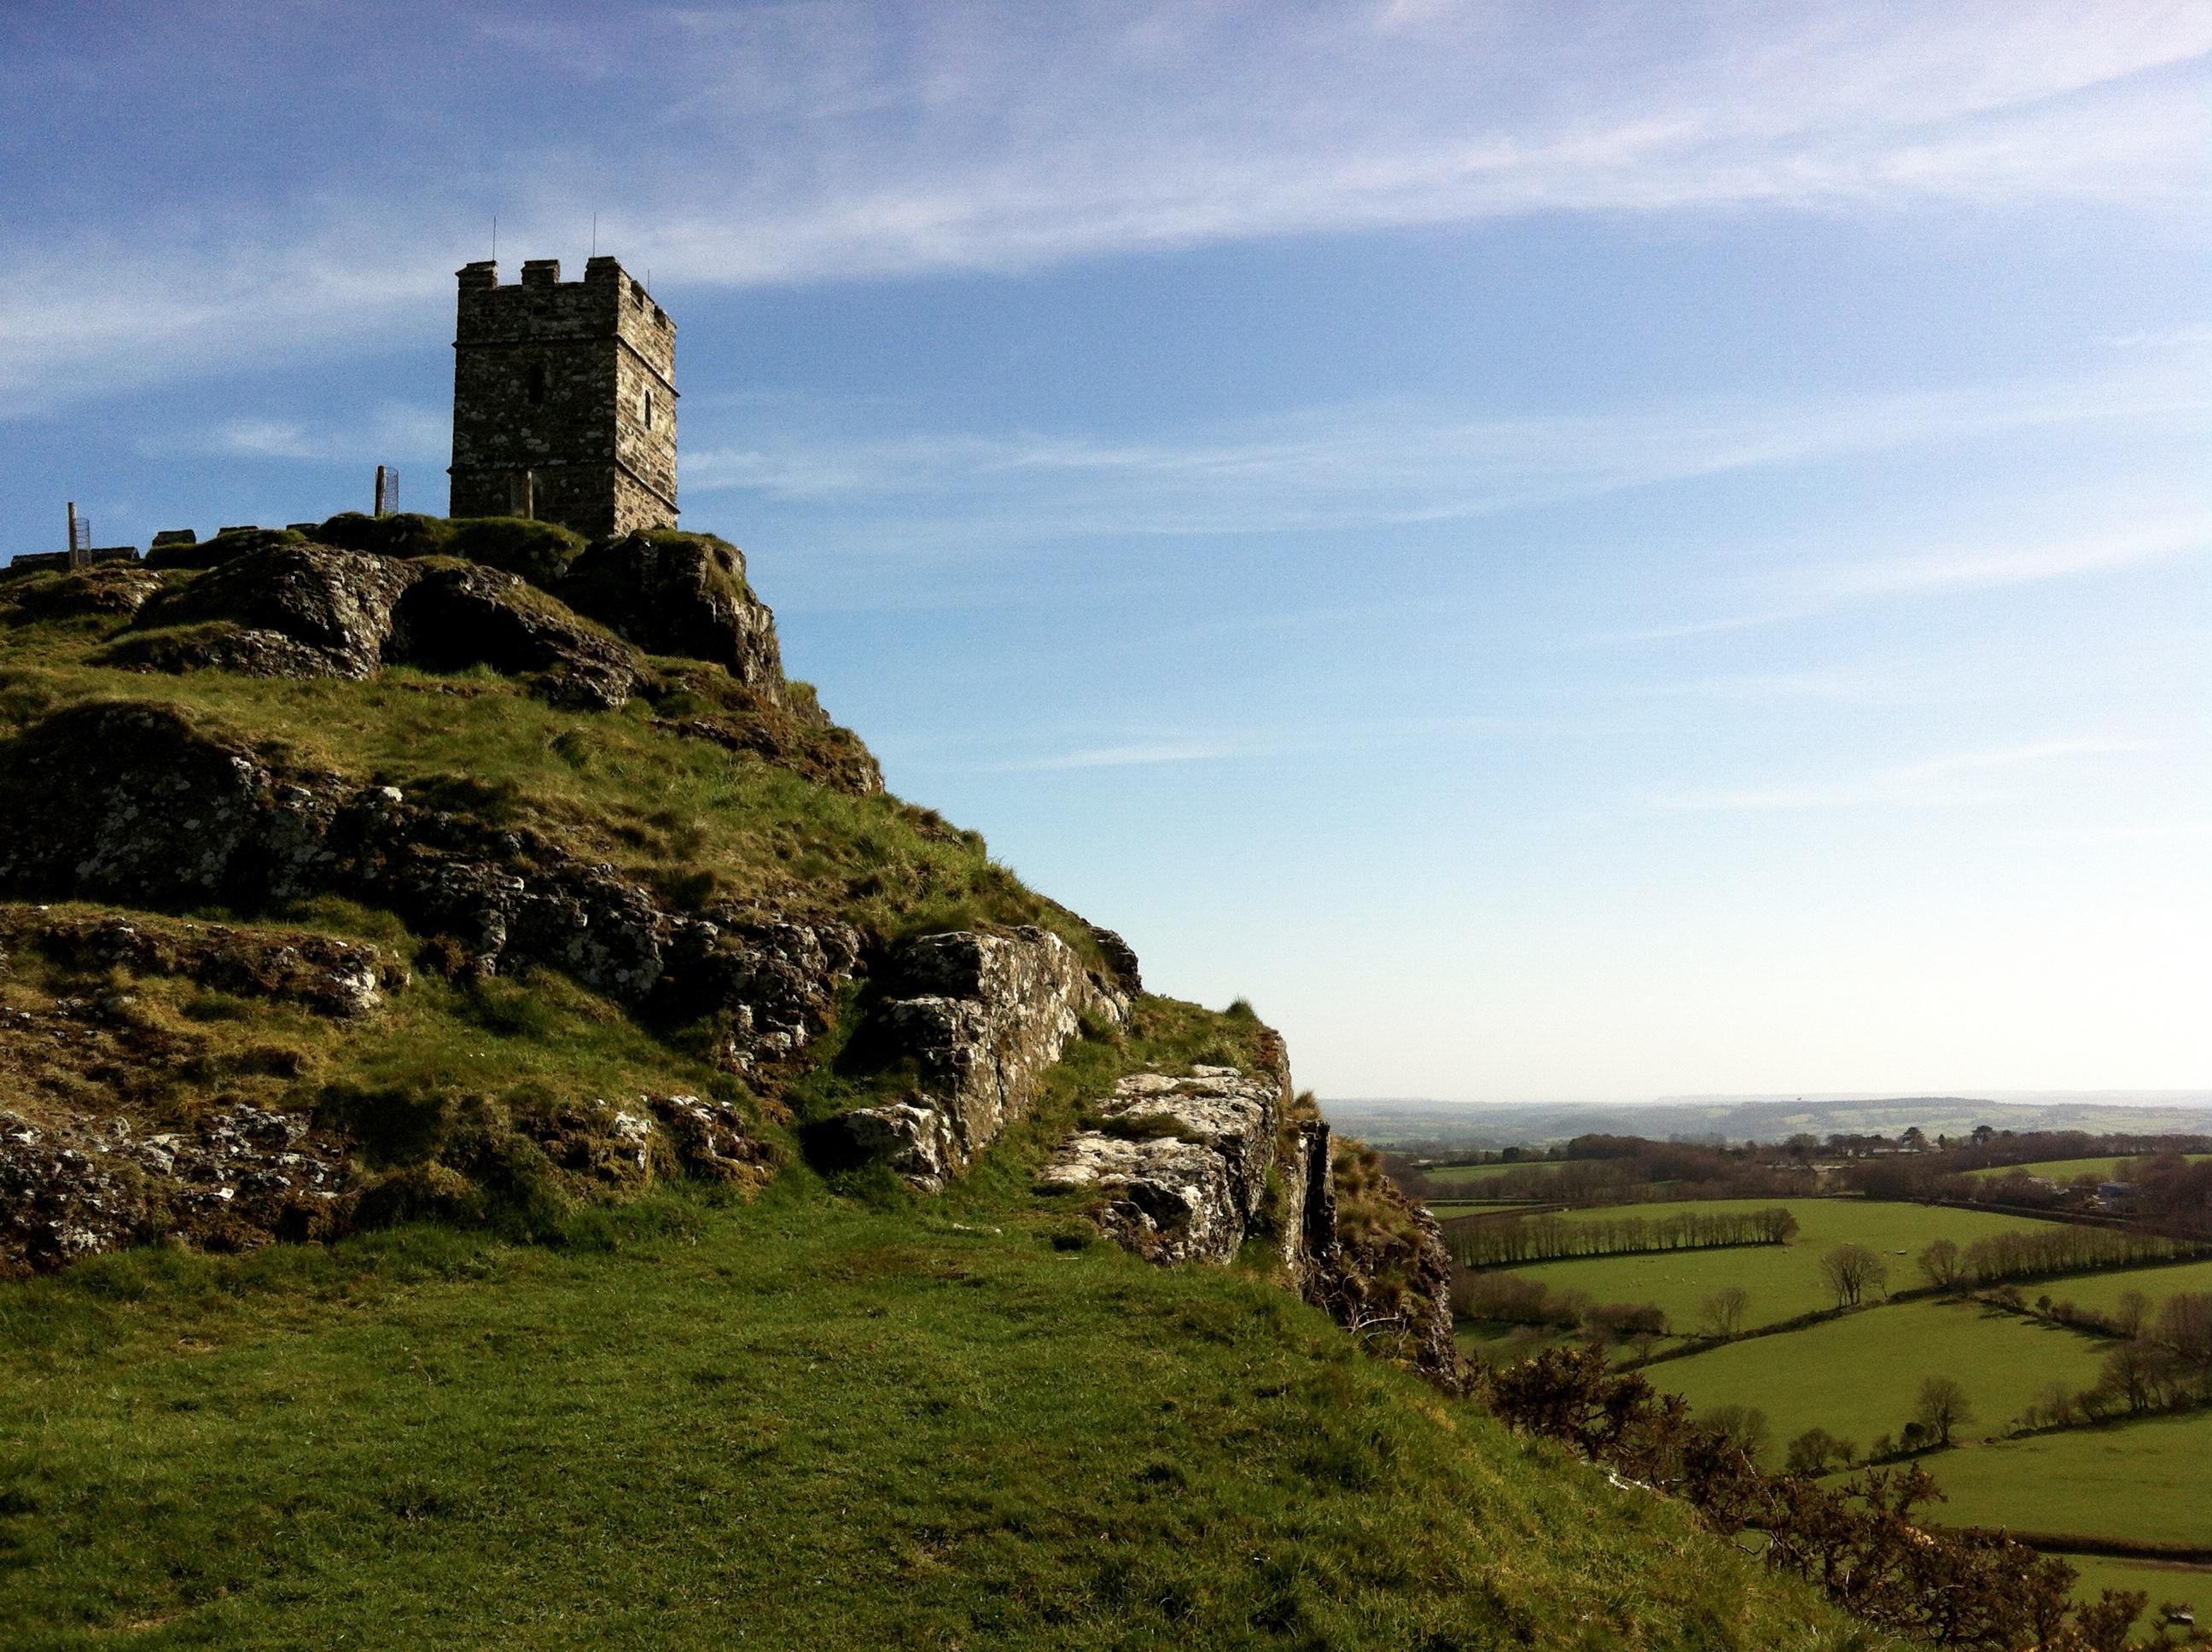 Brentor, near Tavistock, Dartmoor